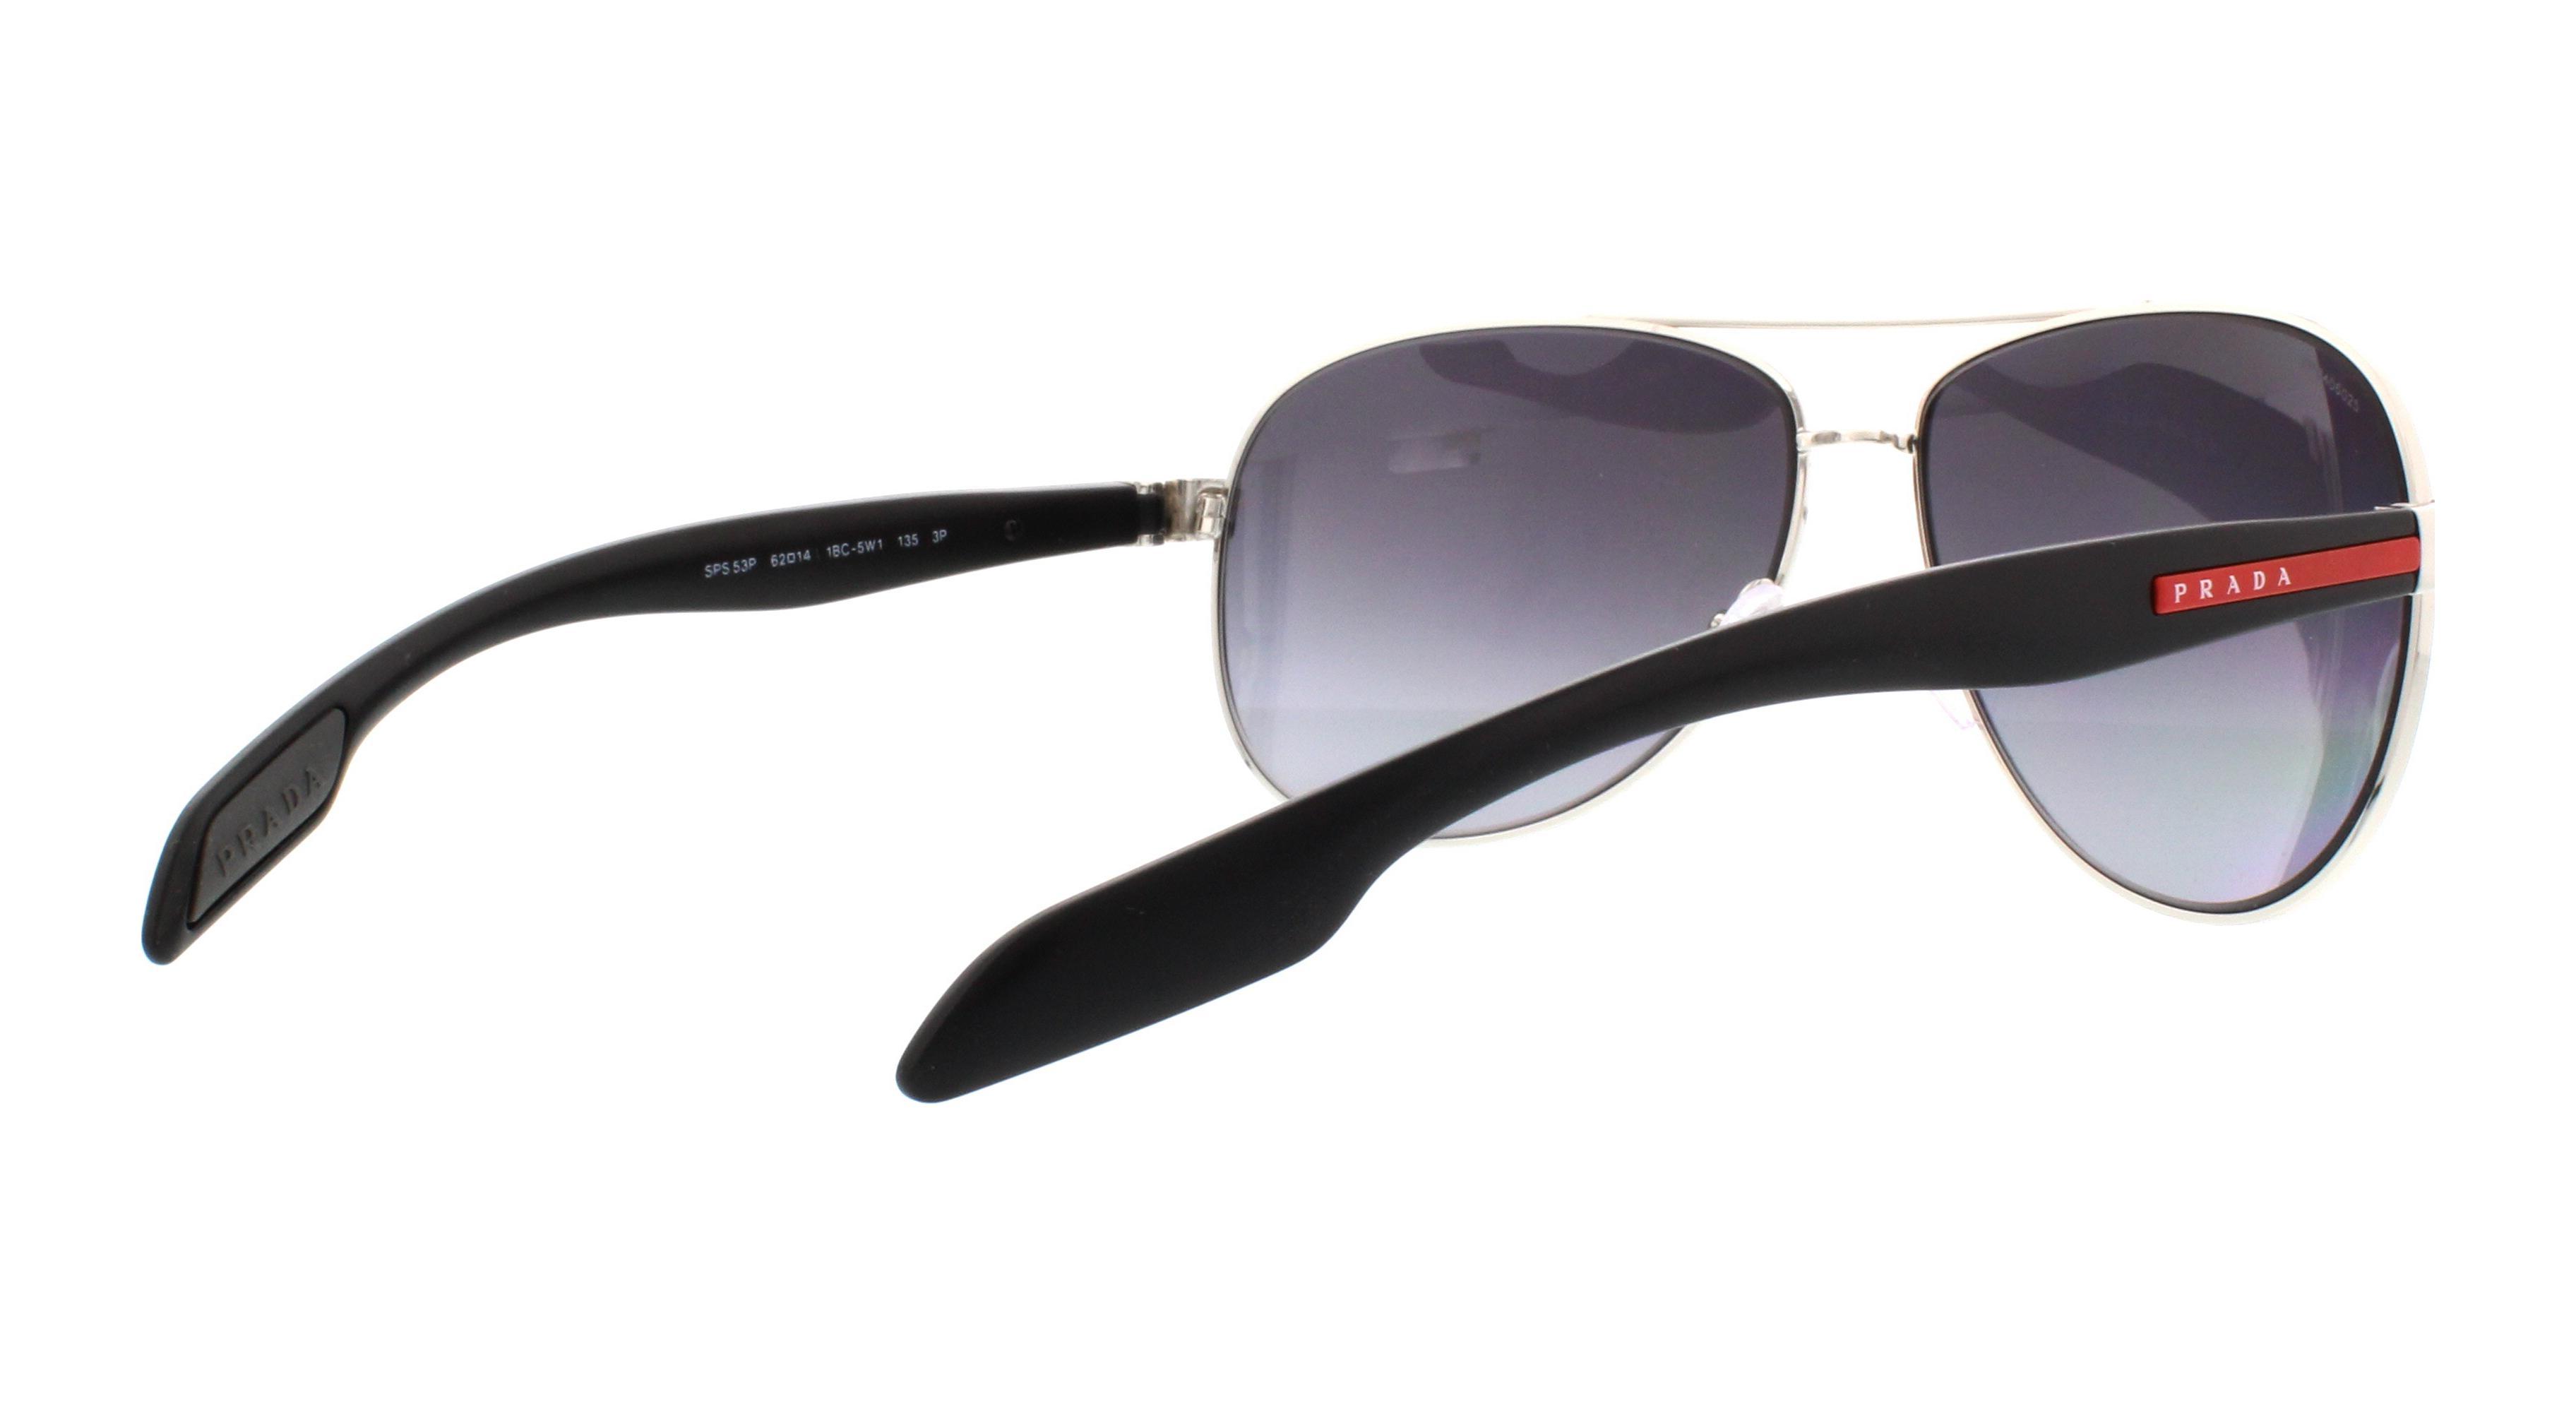 Prada Sport Benbow Sonnenbrille Steel 1BC5W1 Polarisiert 62mm Ohdsi0x